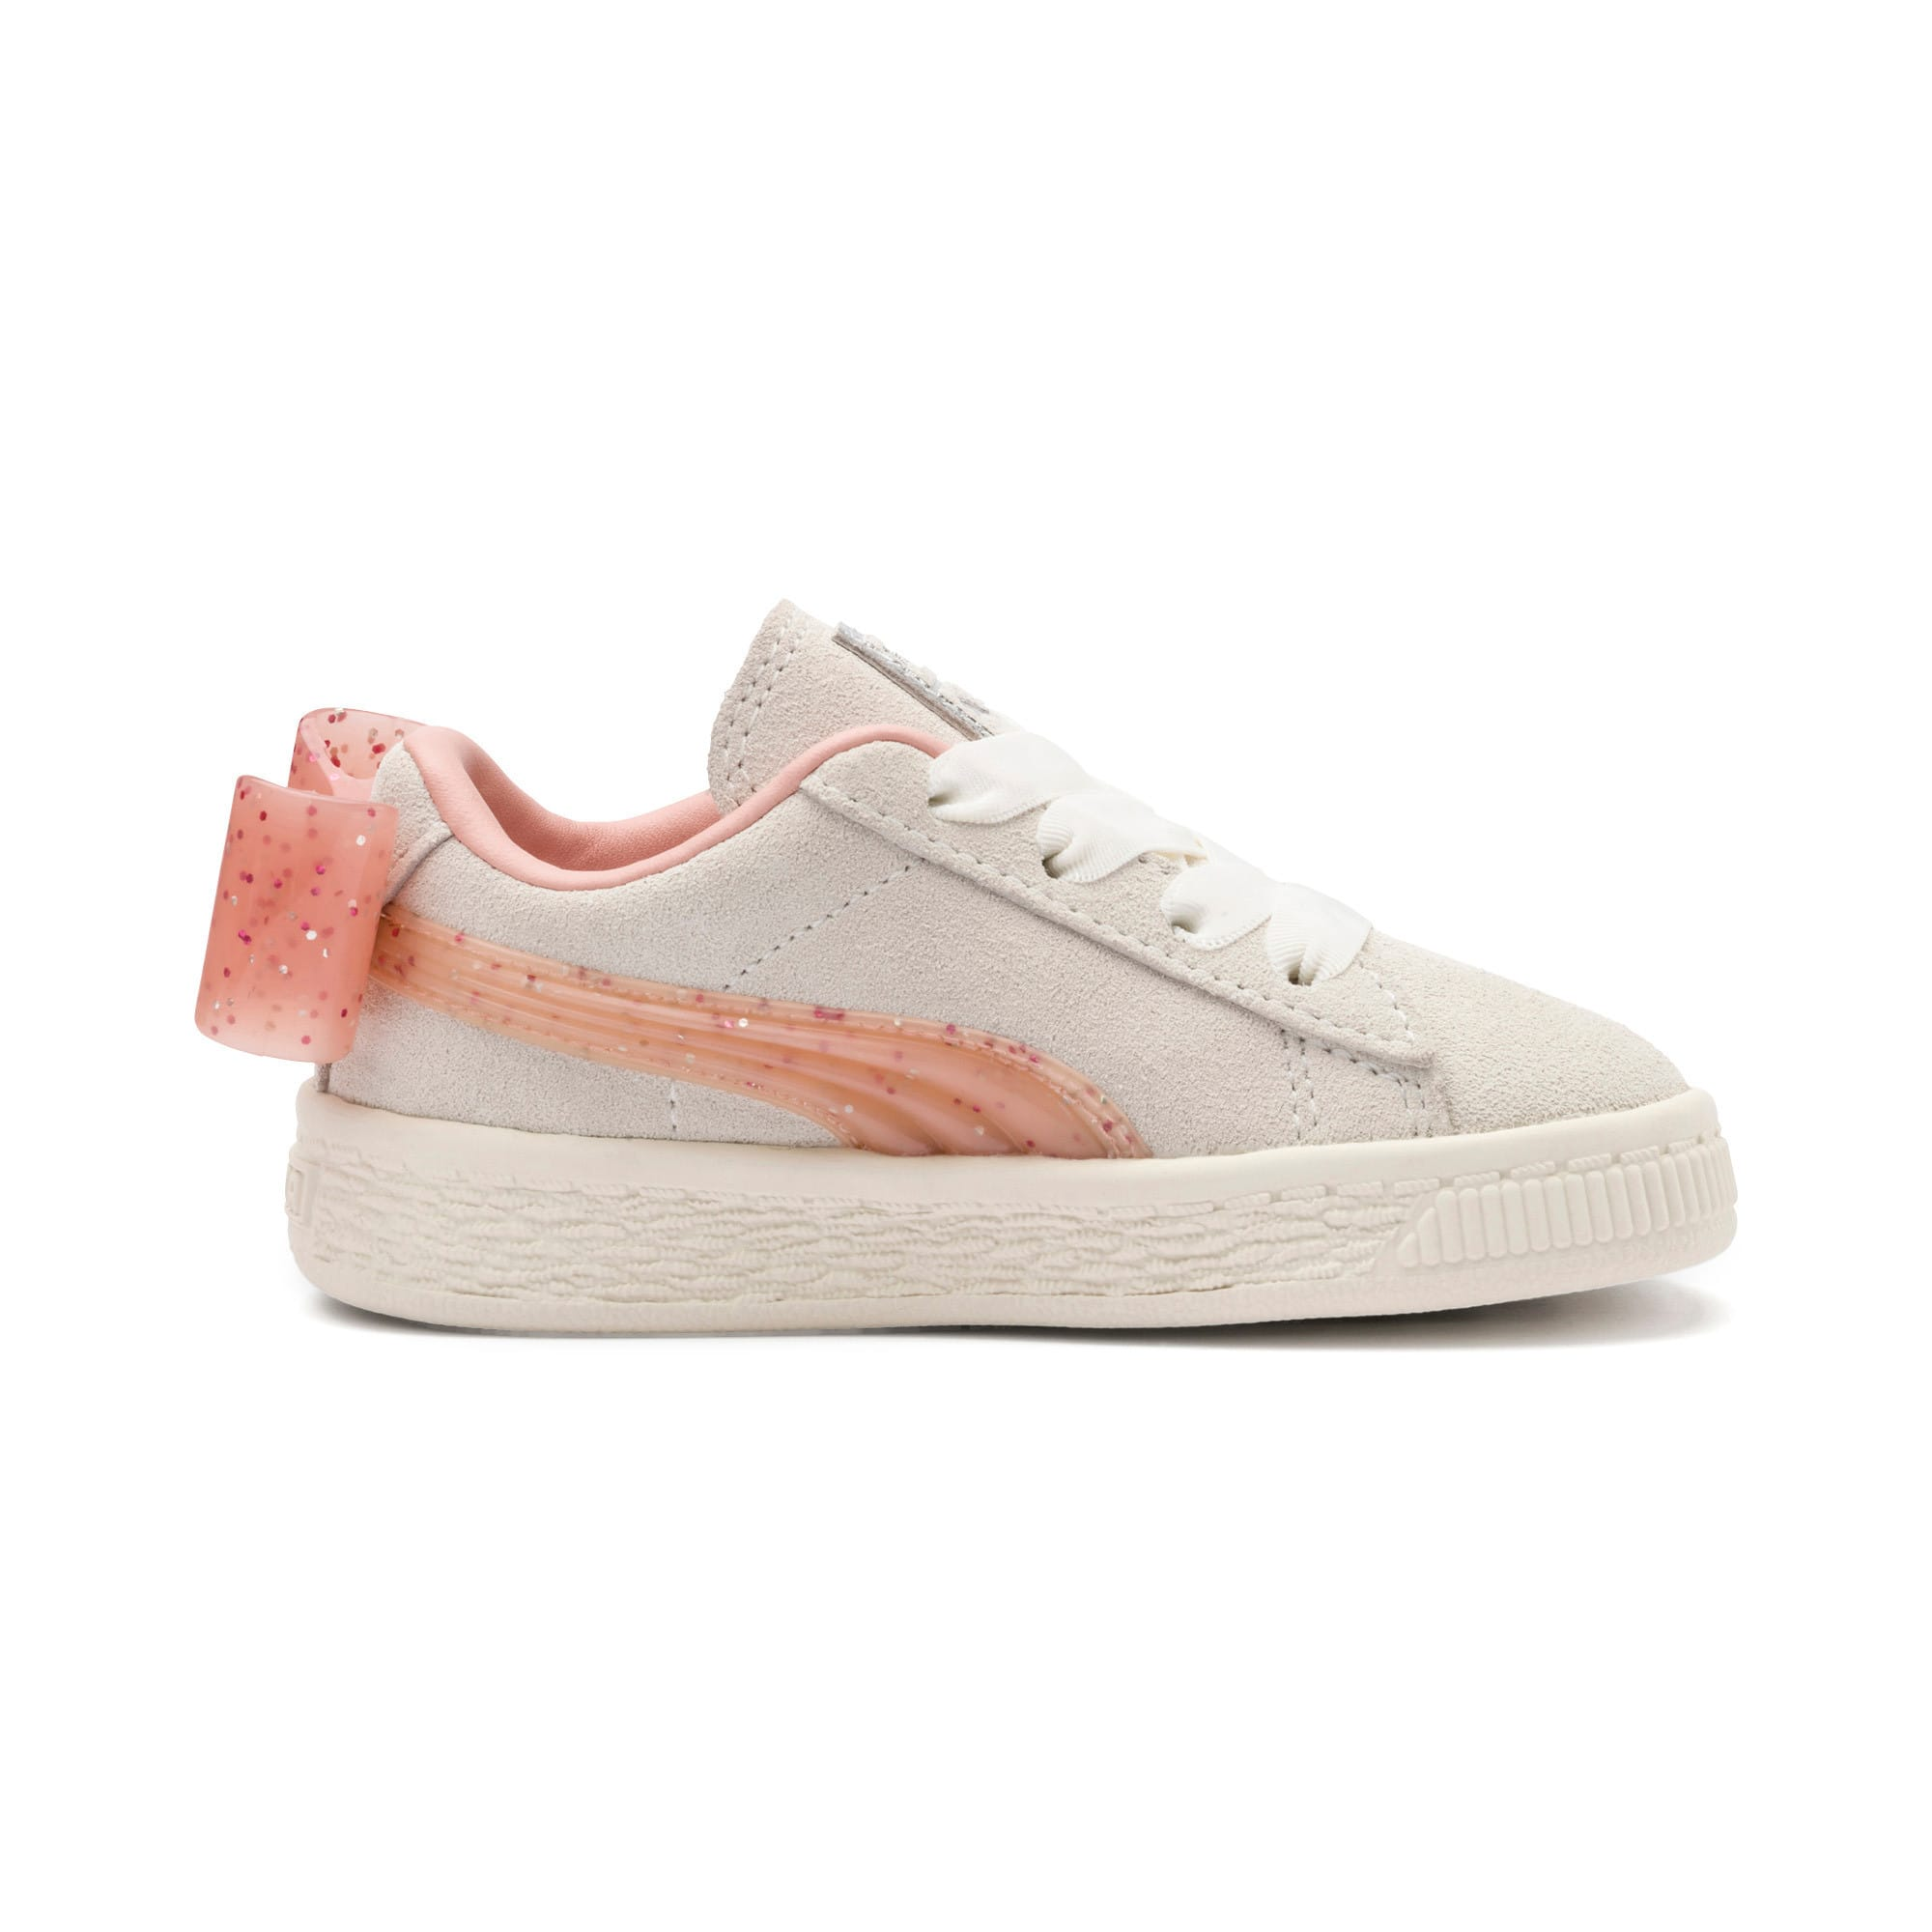 Miniatura 5 de Zapatos Suede Jelly Bow AC para niños, Whis White-Peach Bud-Silver, mediano